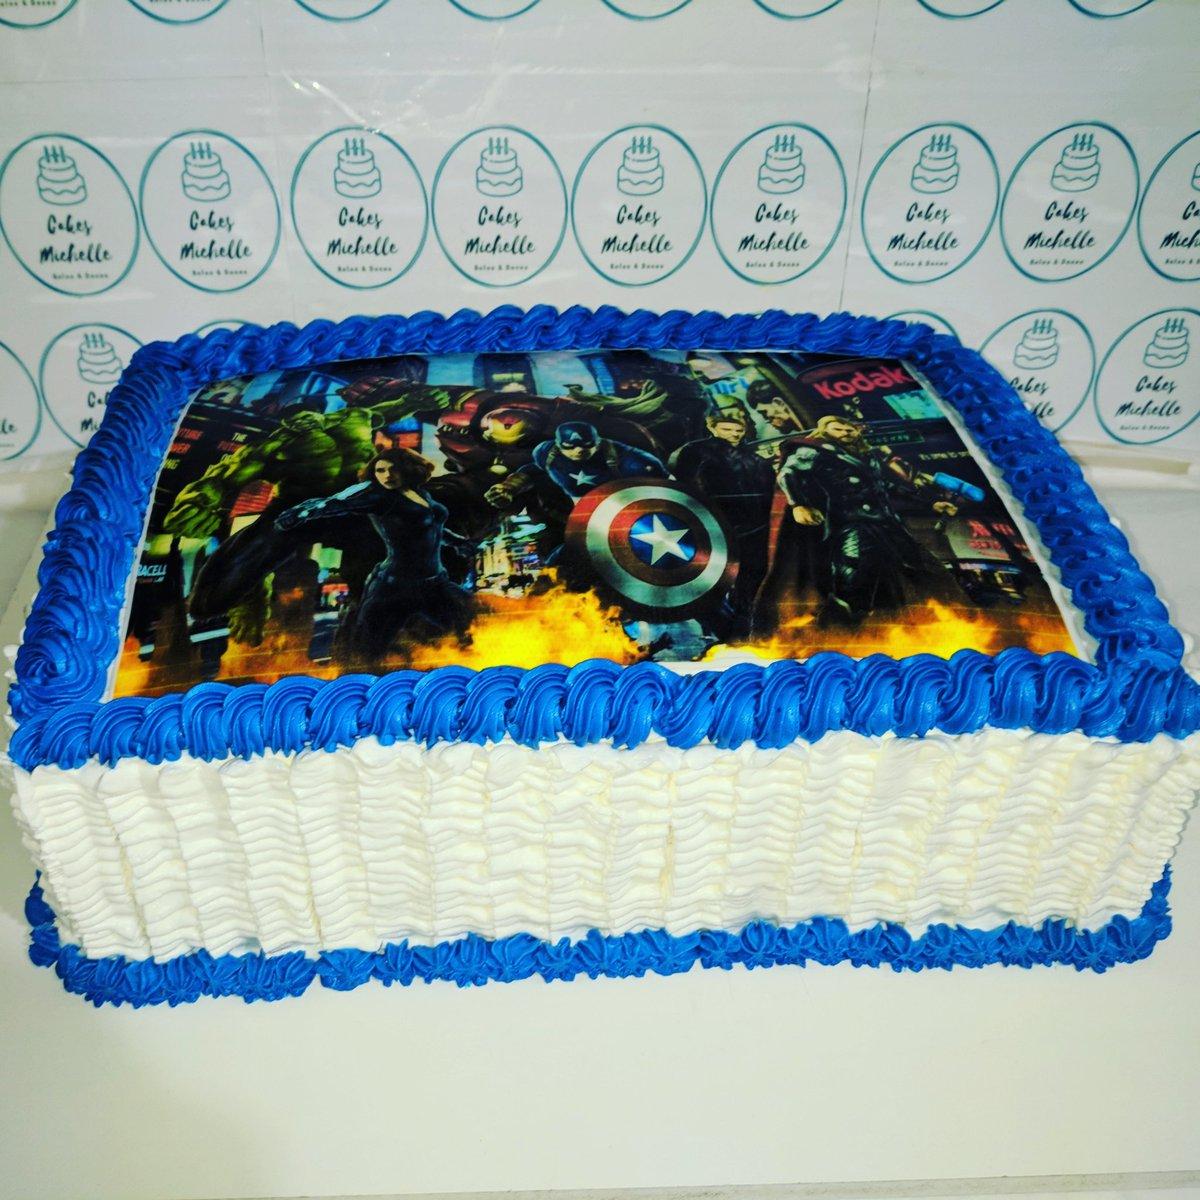 Bolo decorado em chantilly com tema Vingadores 🎂🍰🥧🥞  #cakes #bolos  #chantilly #cakesmichelle #sweet #bolosdecorados #cakedesigner #confeitaria #loveconfeitaria  #bolodefesta #festamenino